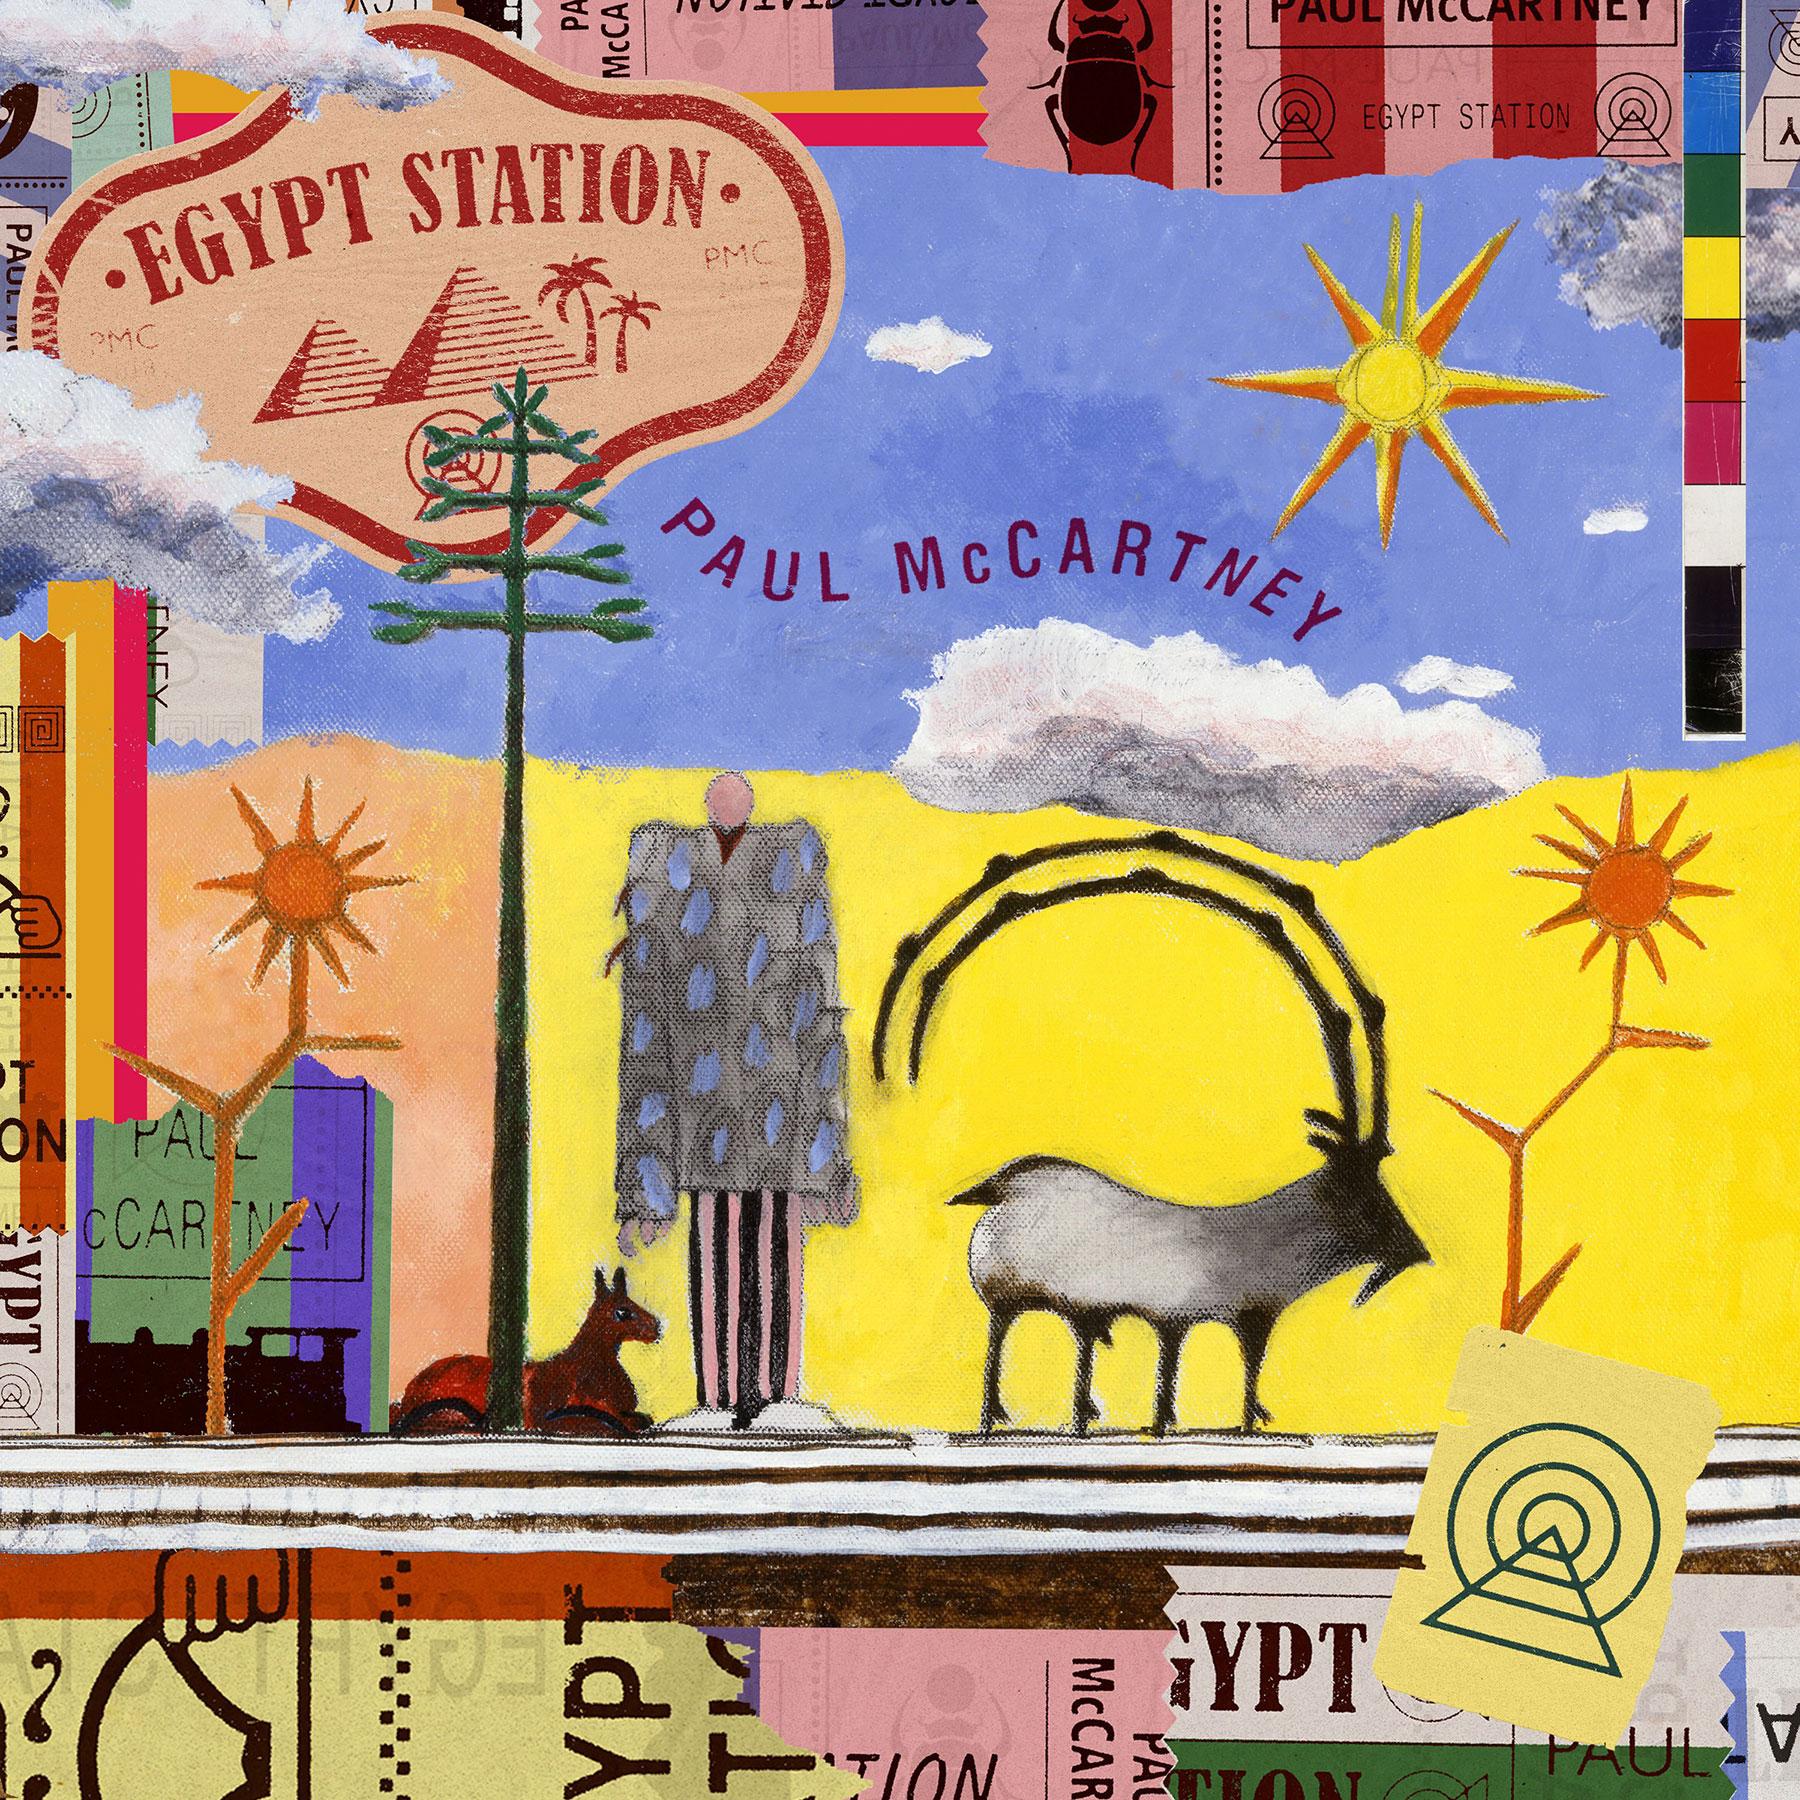 EgyptianStation